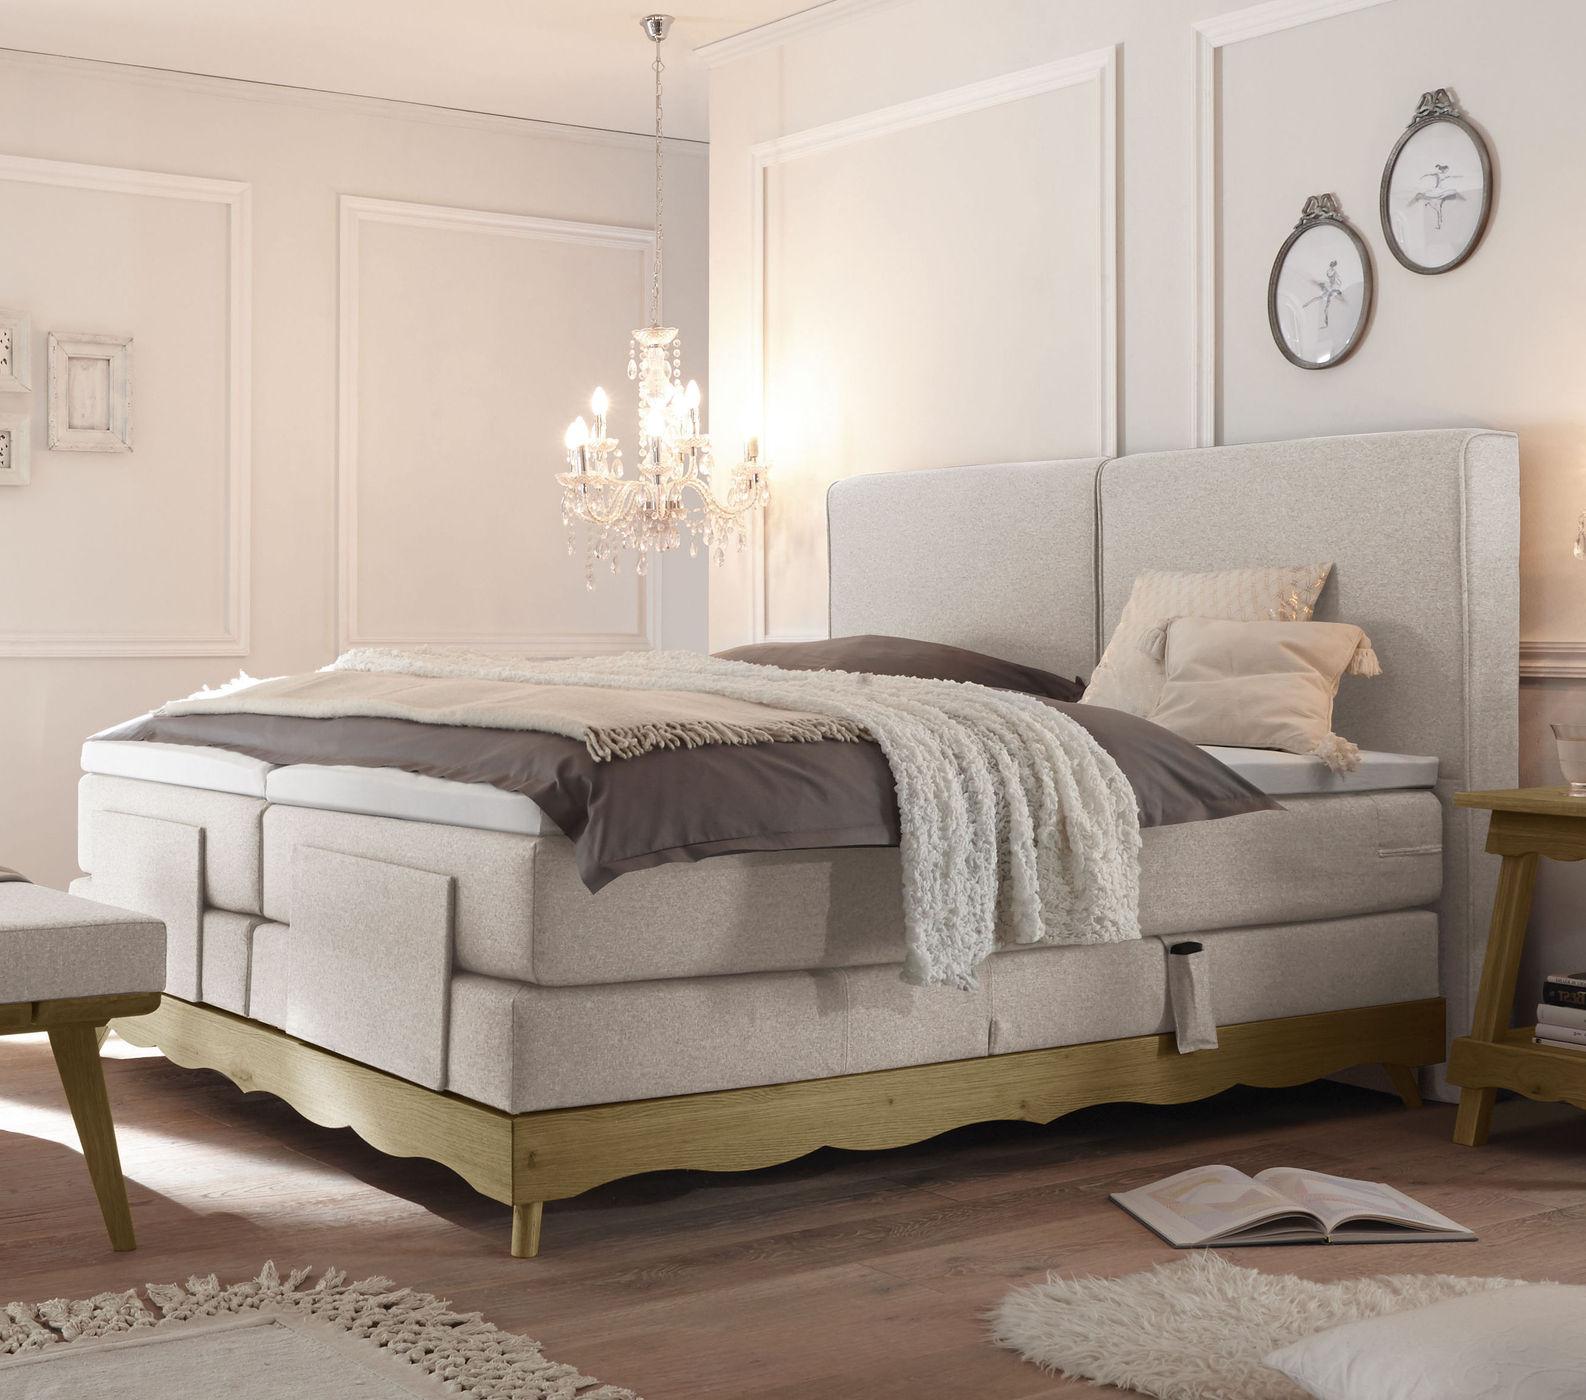 elektro boxspringbett inklusive luxus matratze und topper. Black Bedroom Furniture Sets. Home Design Ideas